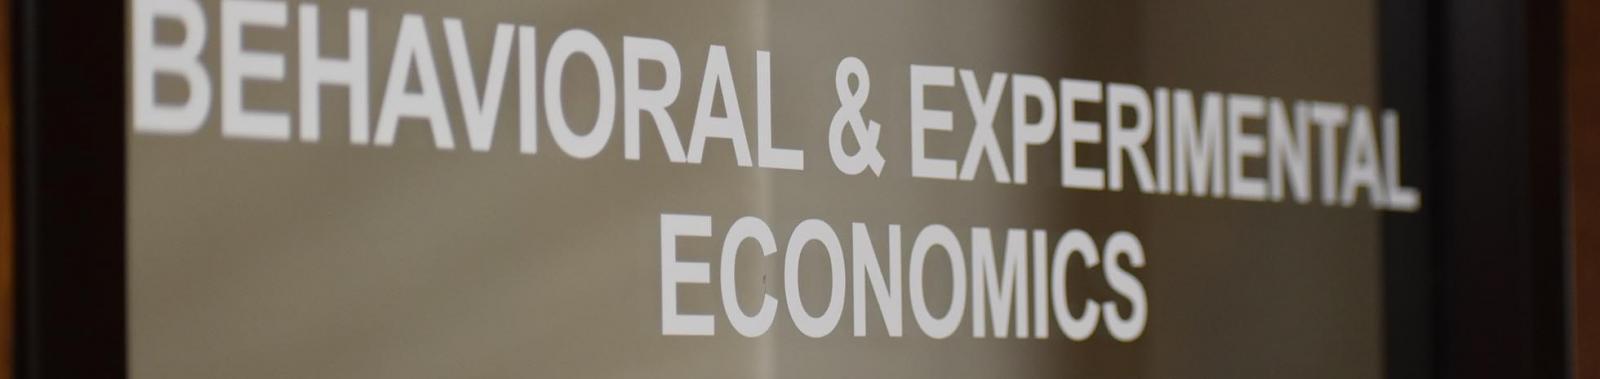 Photo of text: Behavioral & Experimental Economics